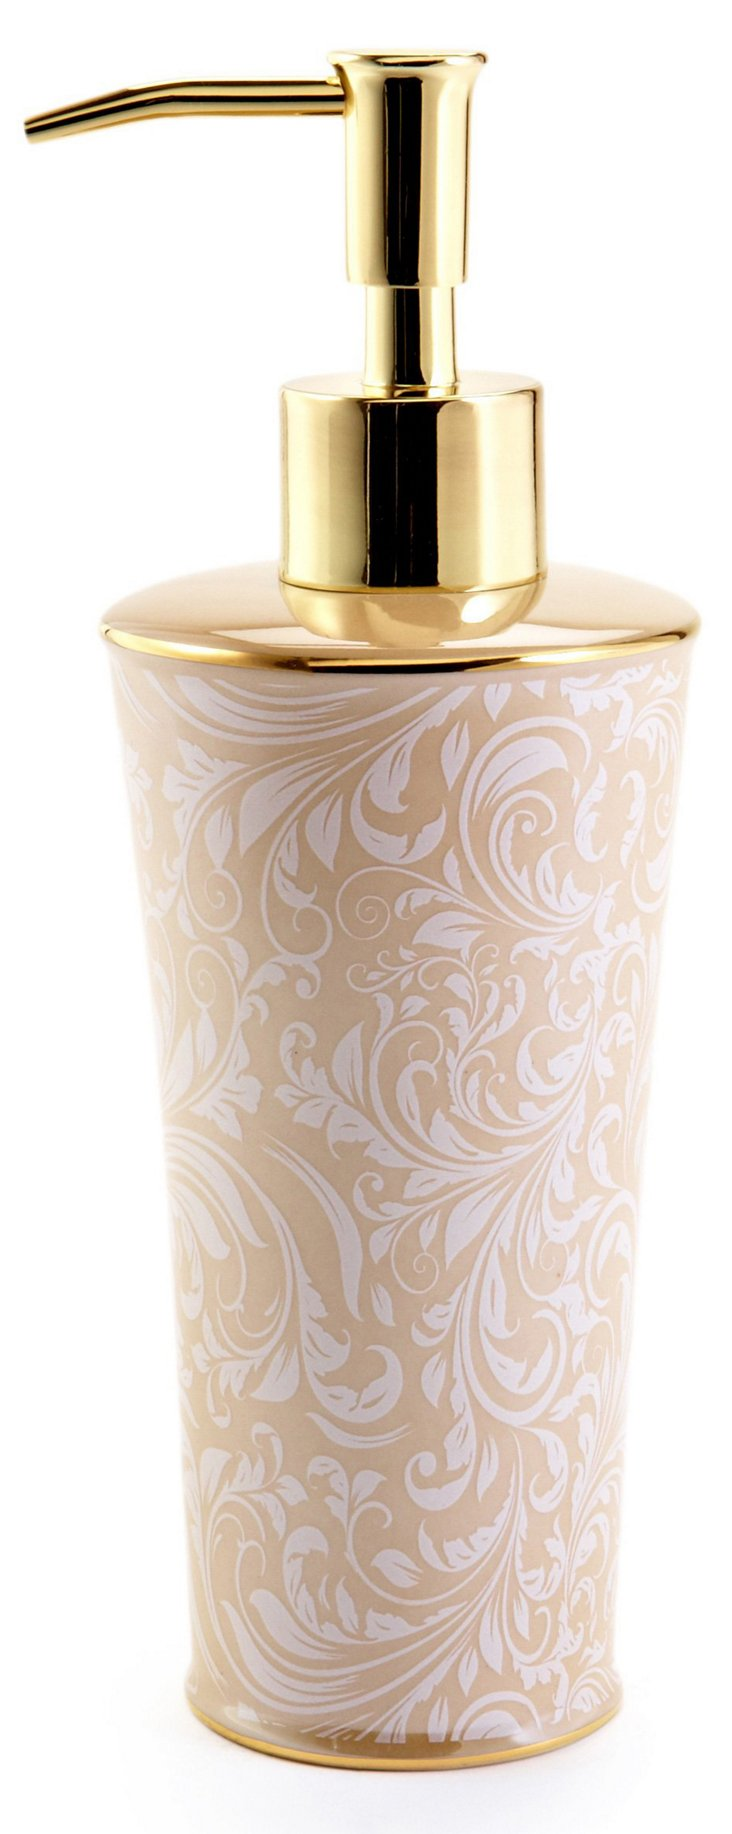 Bedminster Lotion Dispenser, Crème